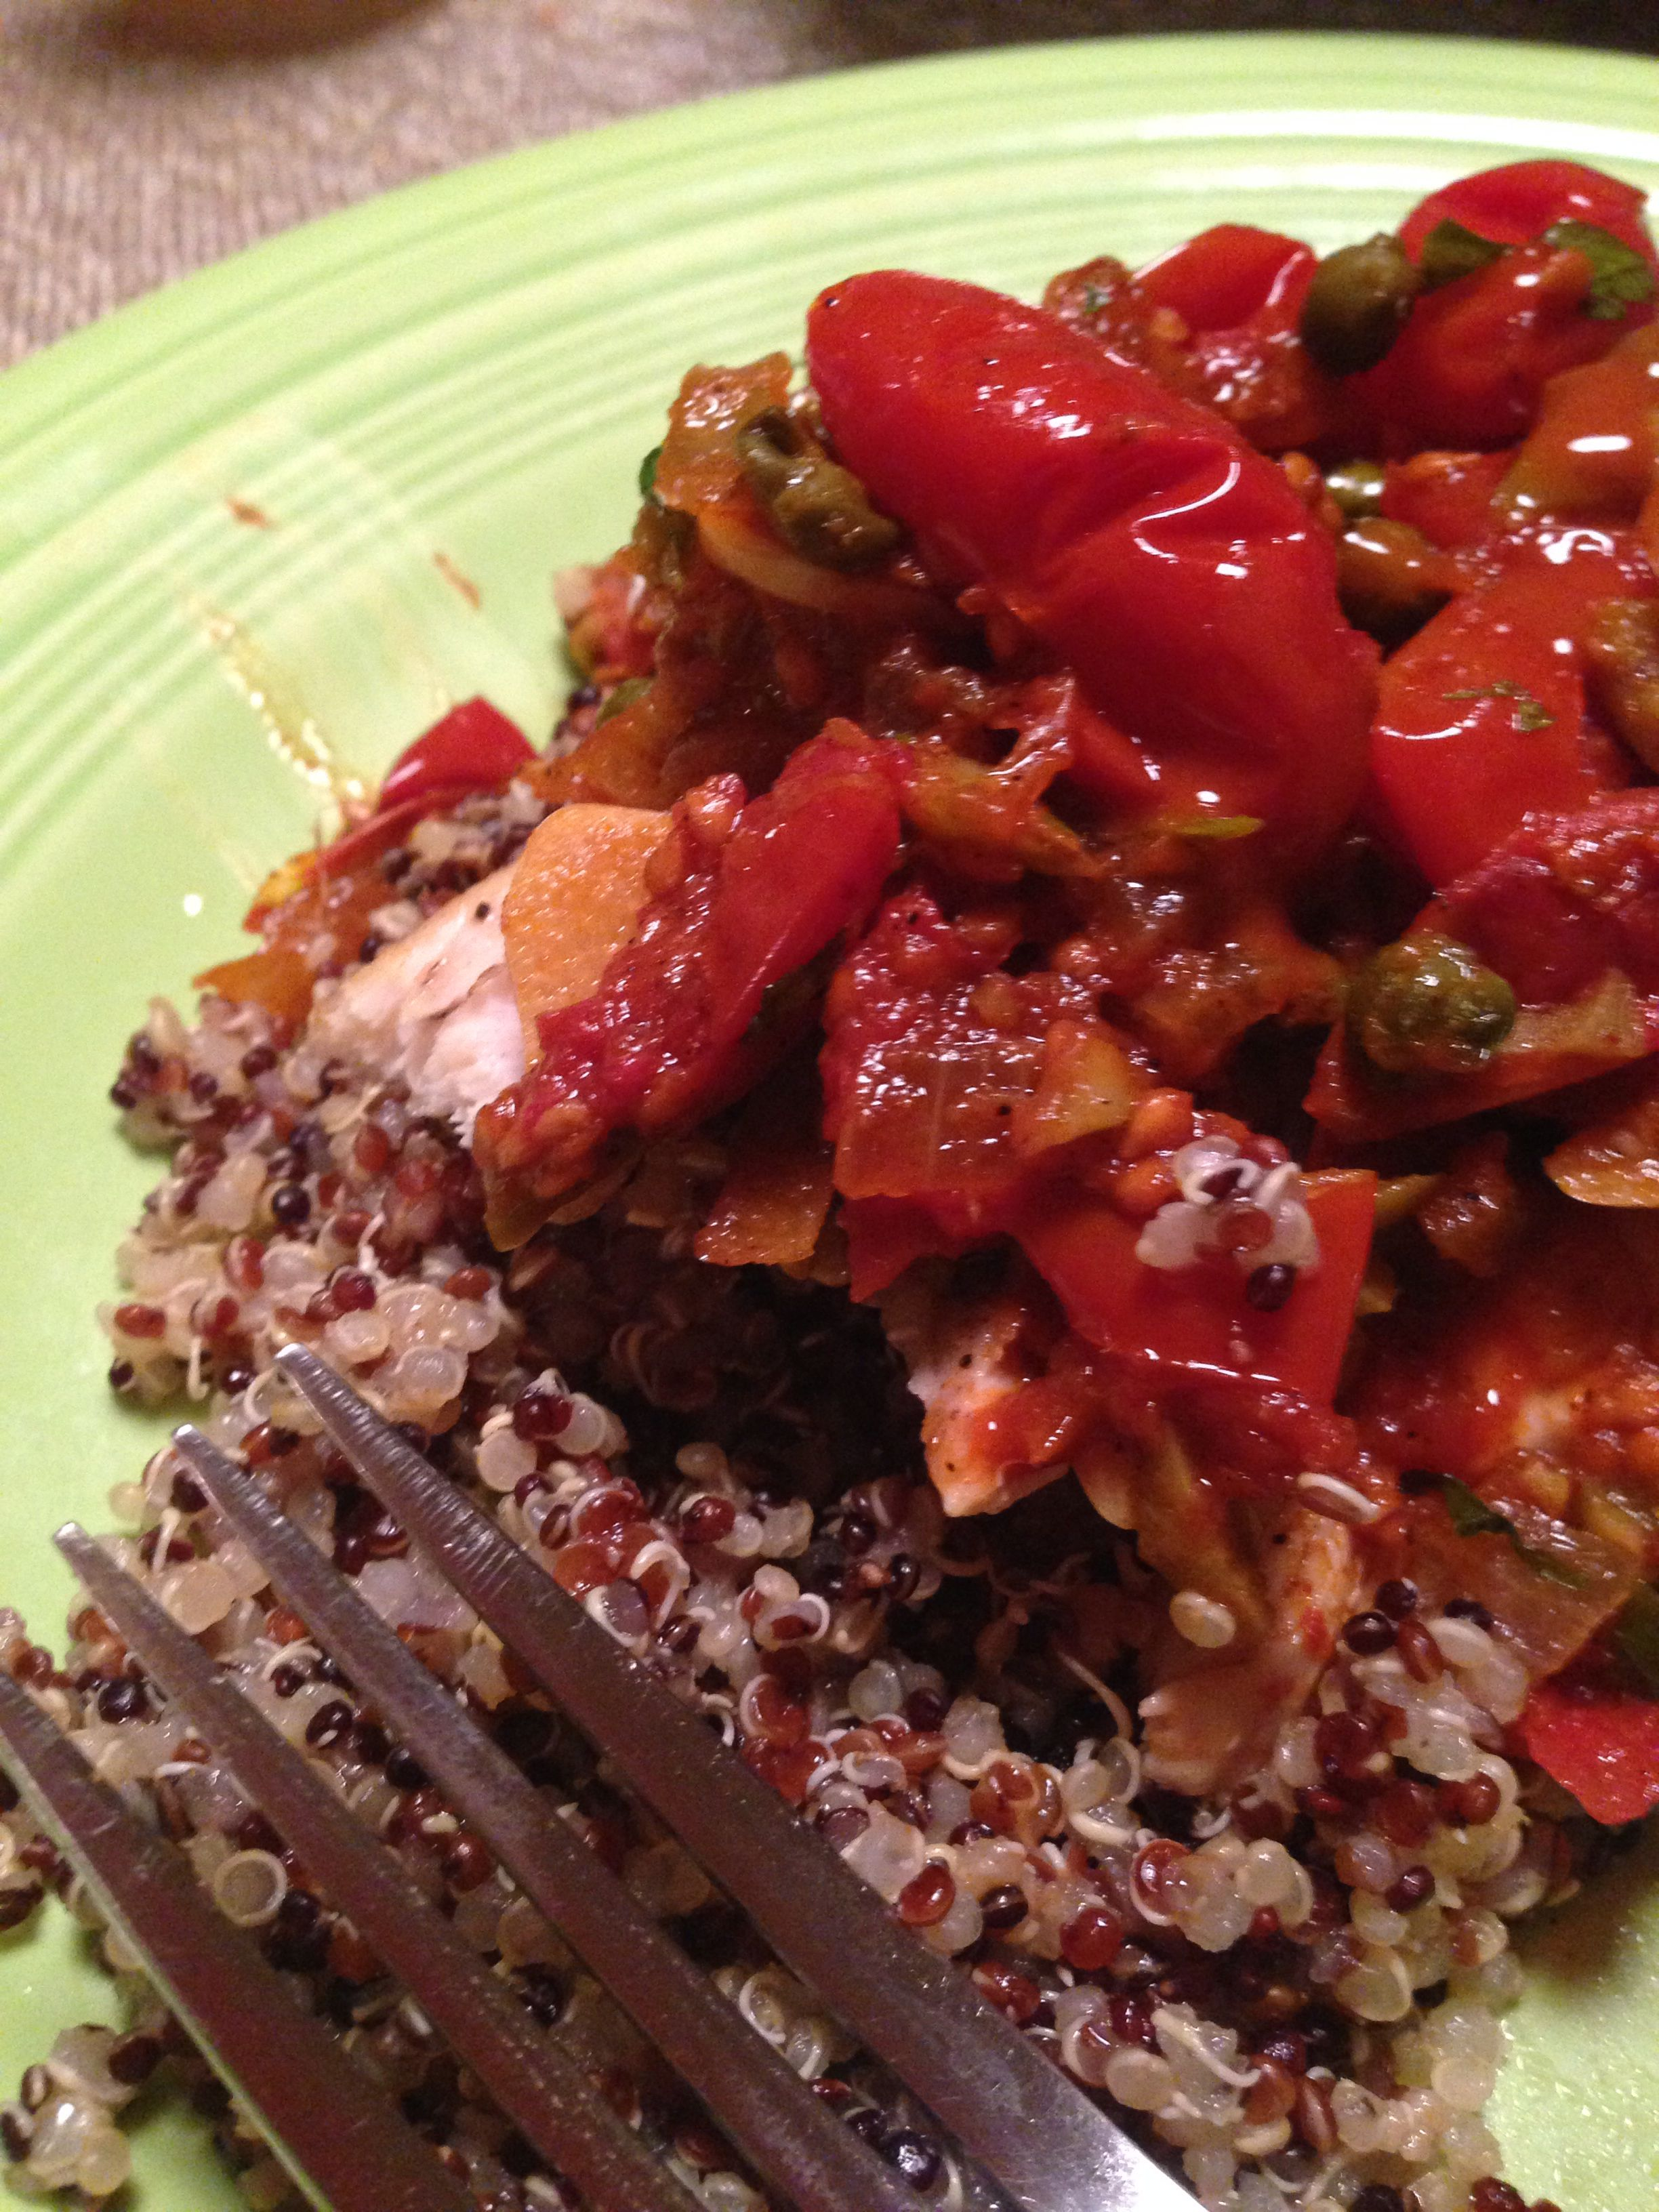 Magi Mahi Livornese Over Black Quinoa Healthy And Full Of Flavor Quinoa Healthy Dinner Tonight Dinner